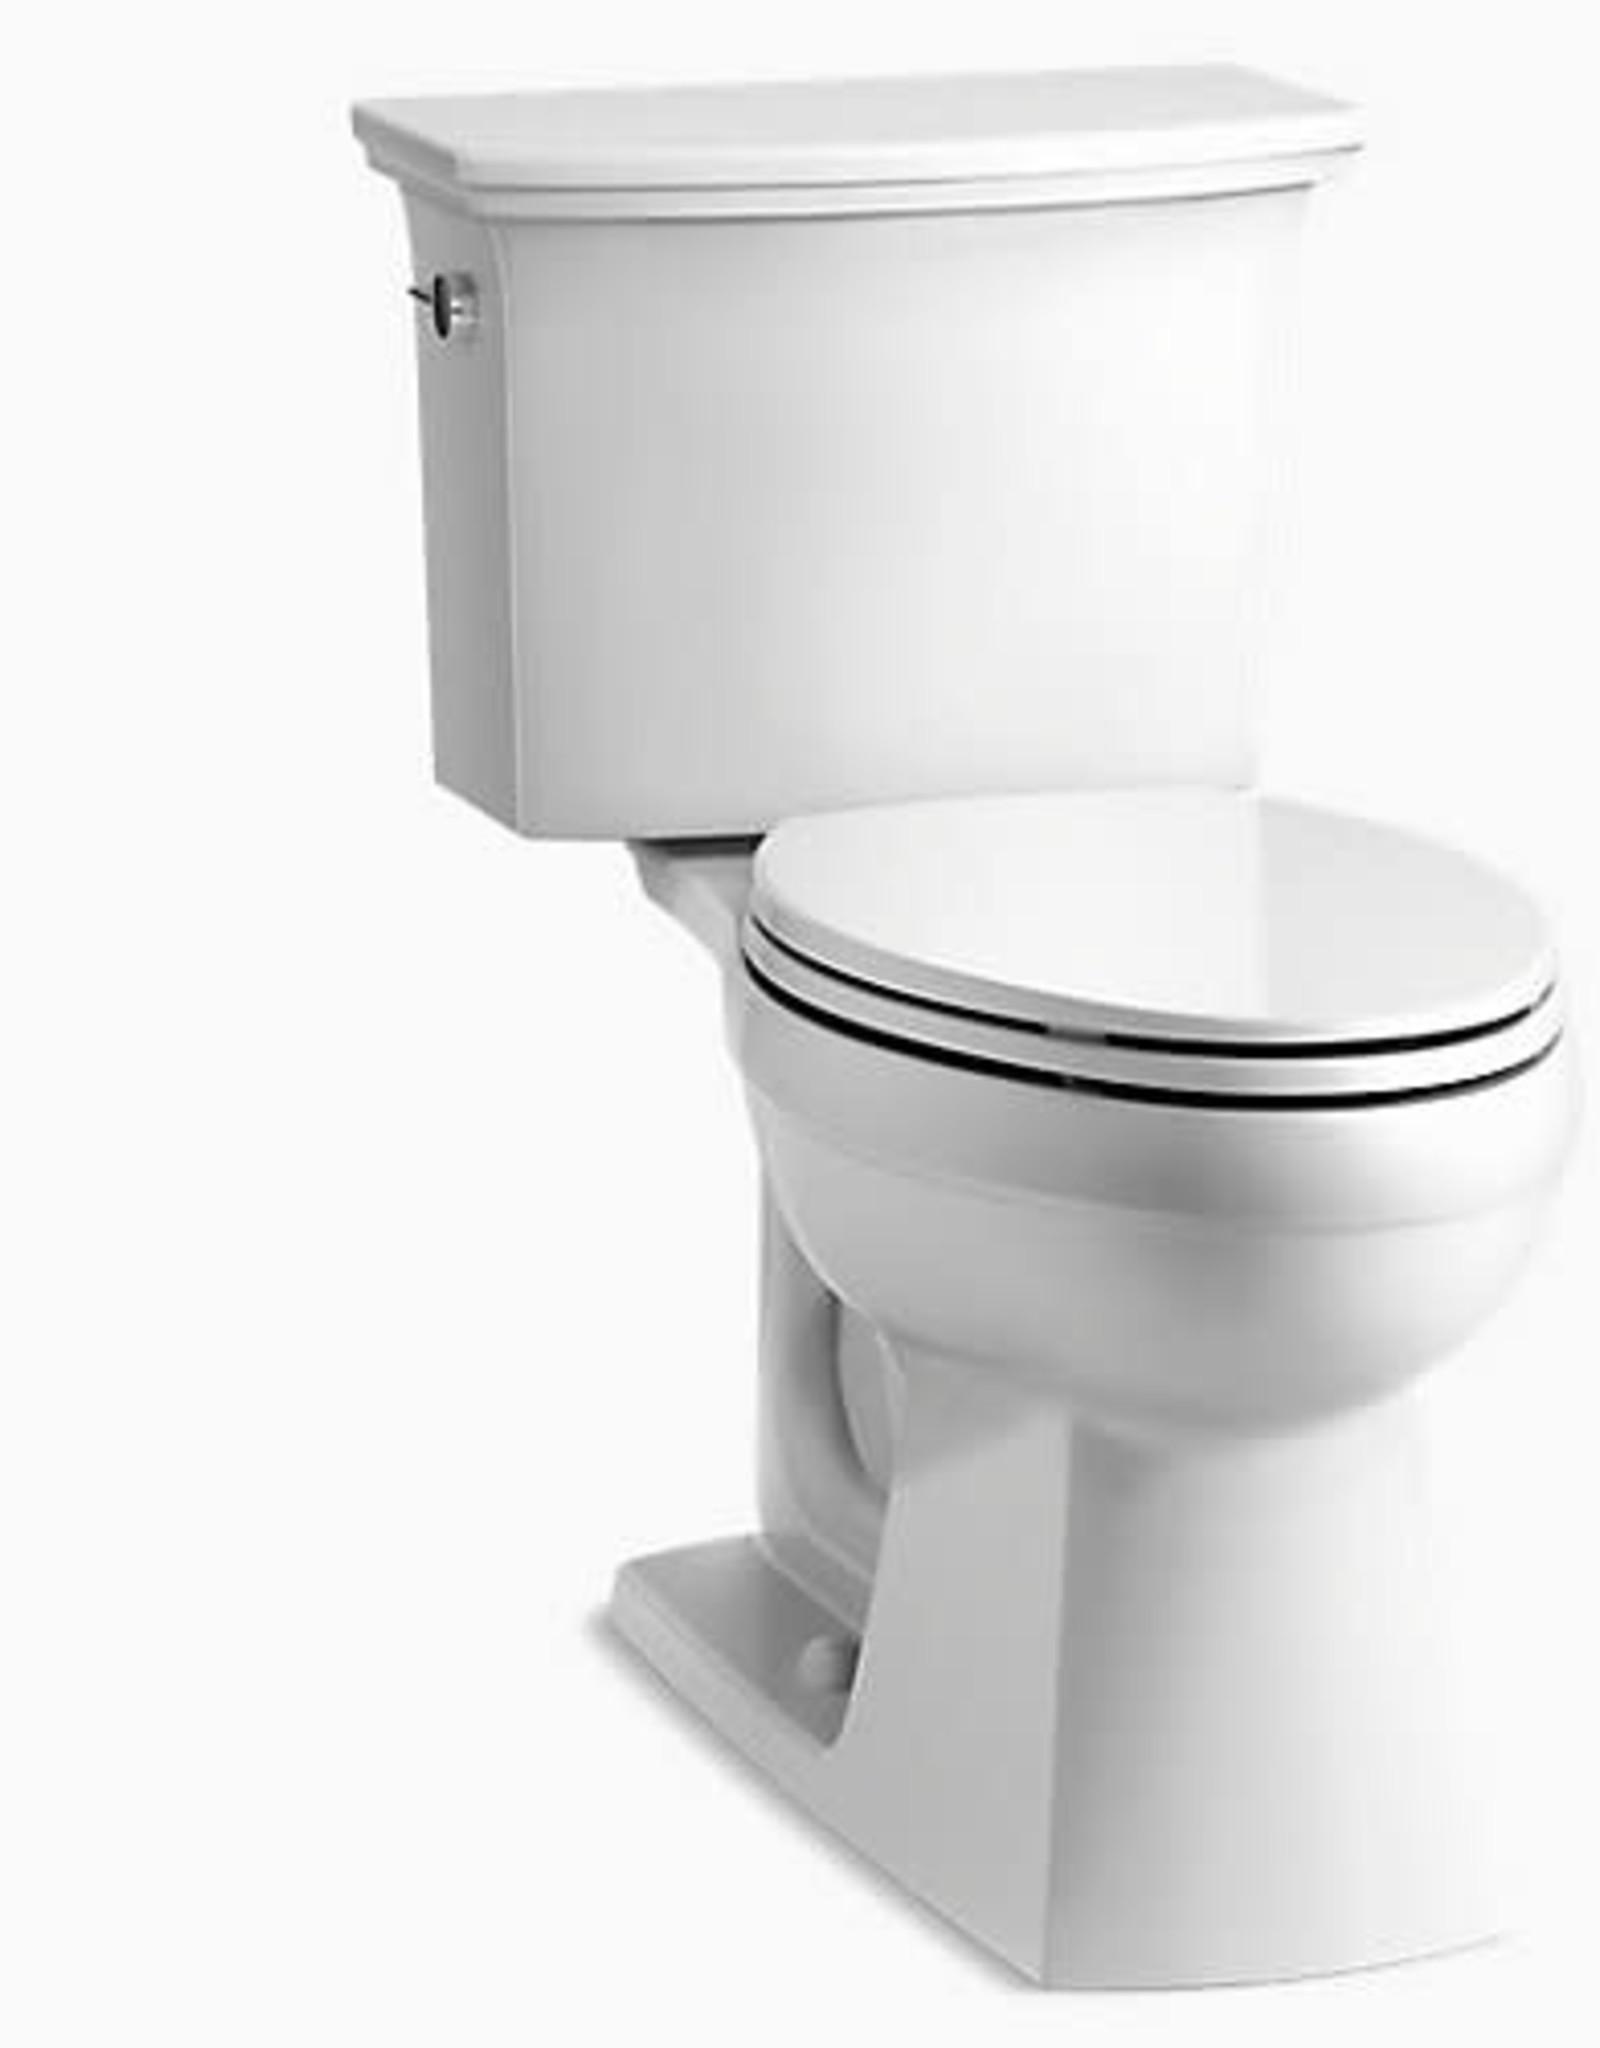 KOHLER COMPANY Kohler LIntelle 2PC Elongated Complete Toilet